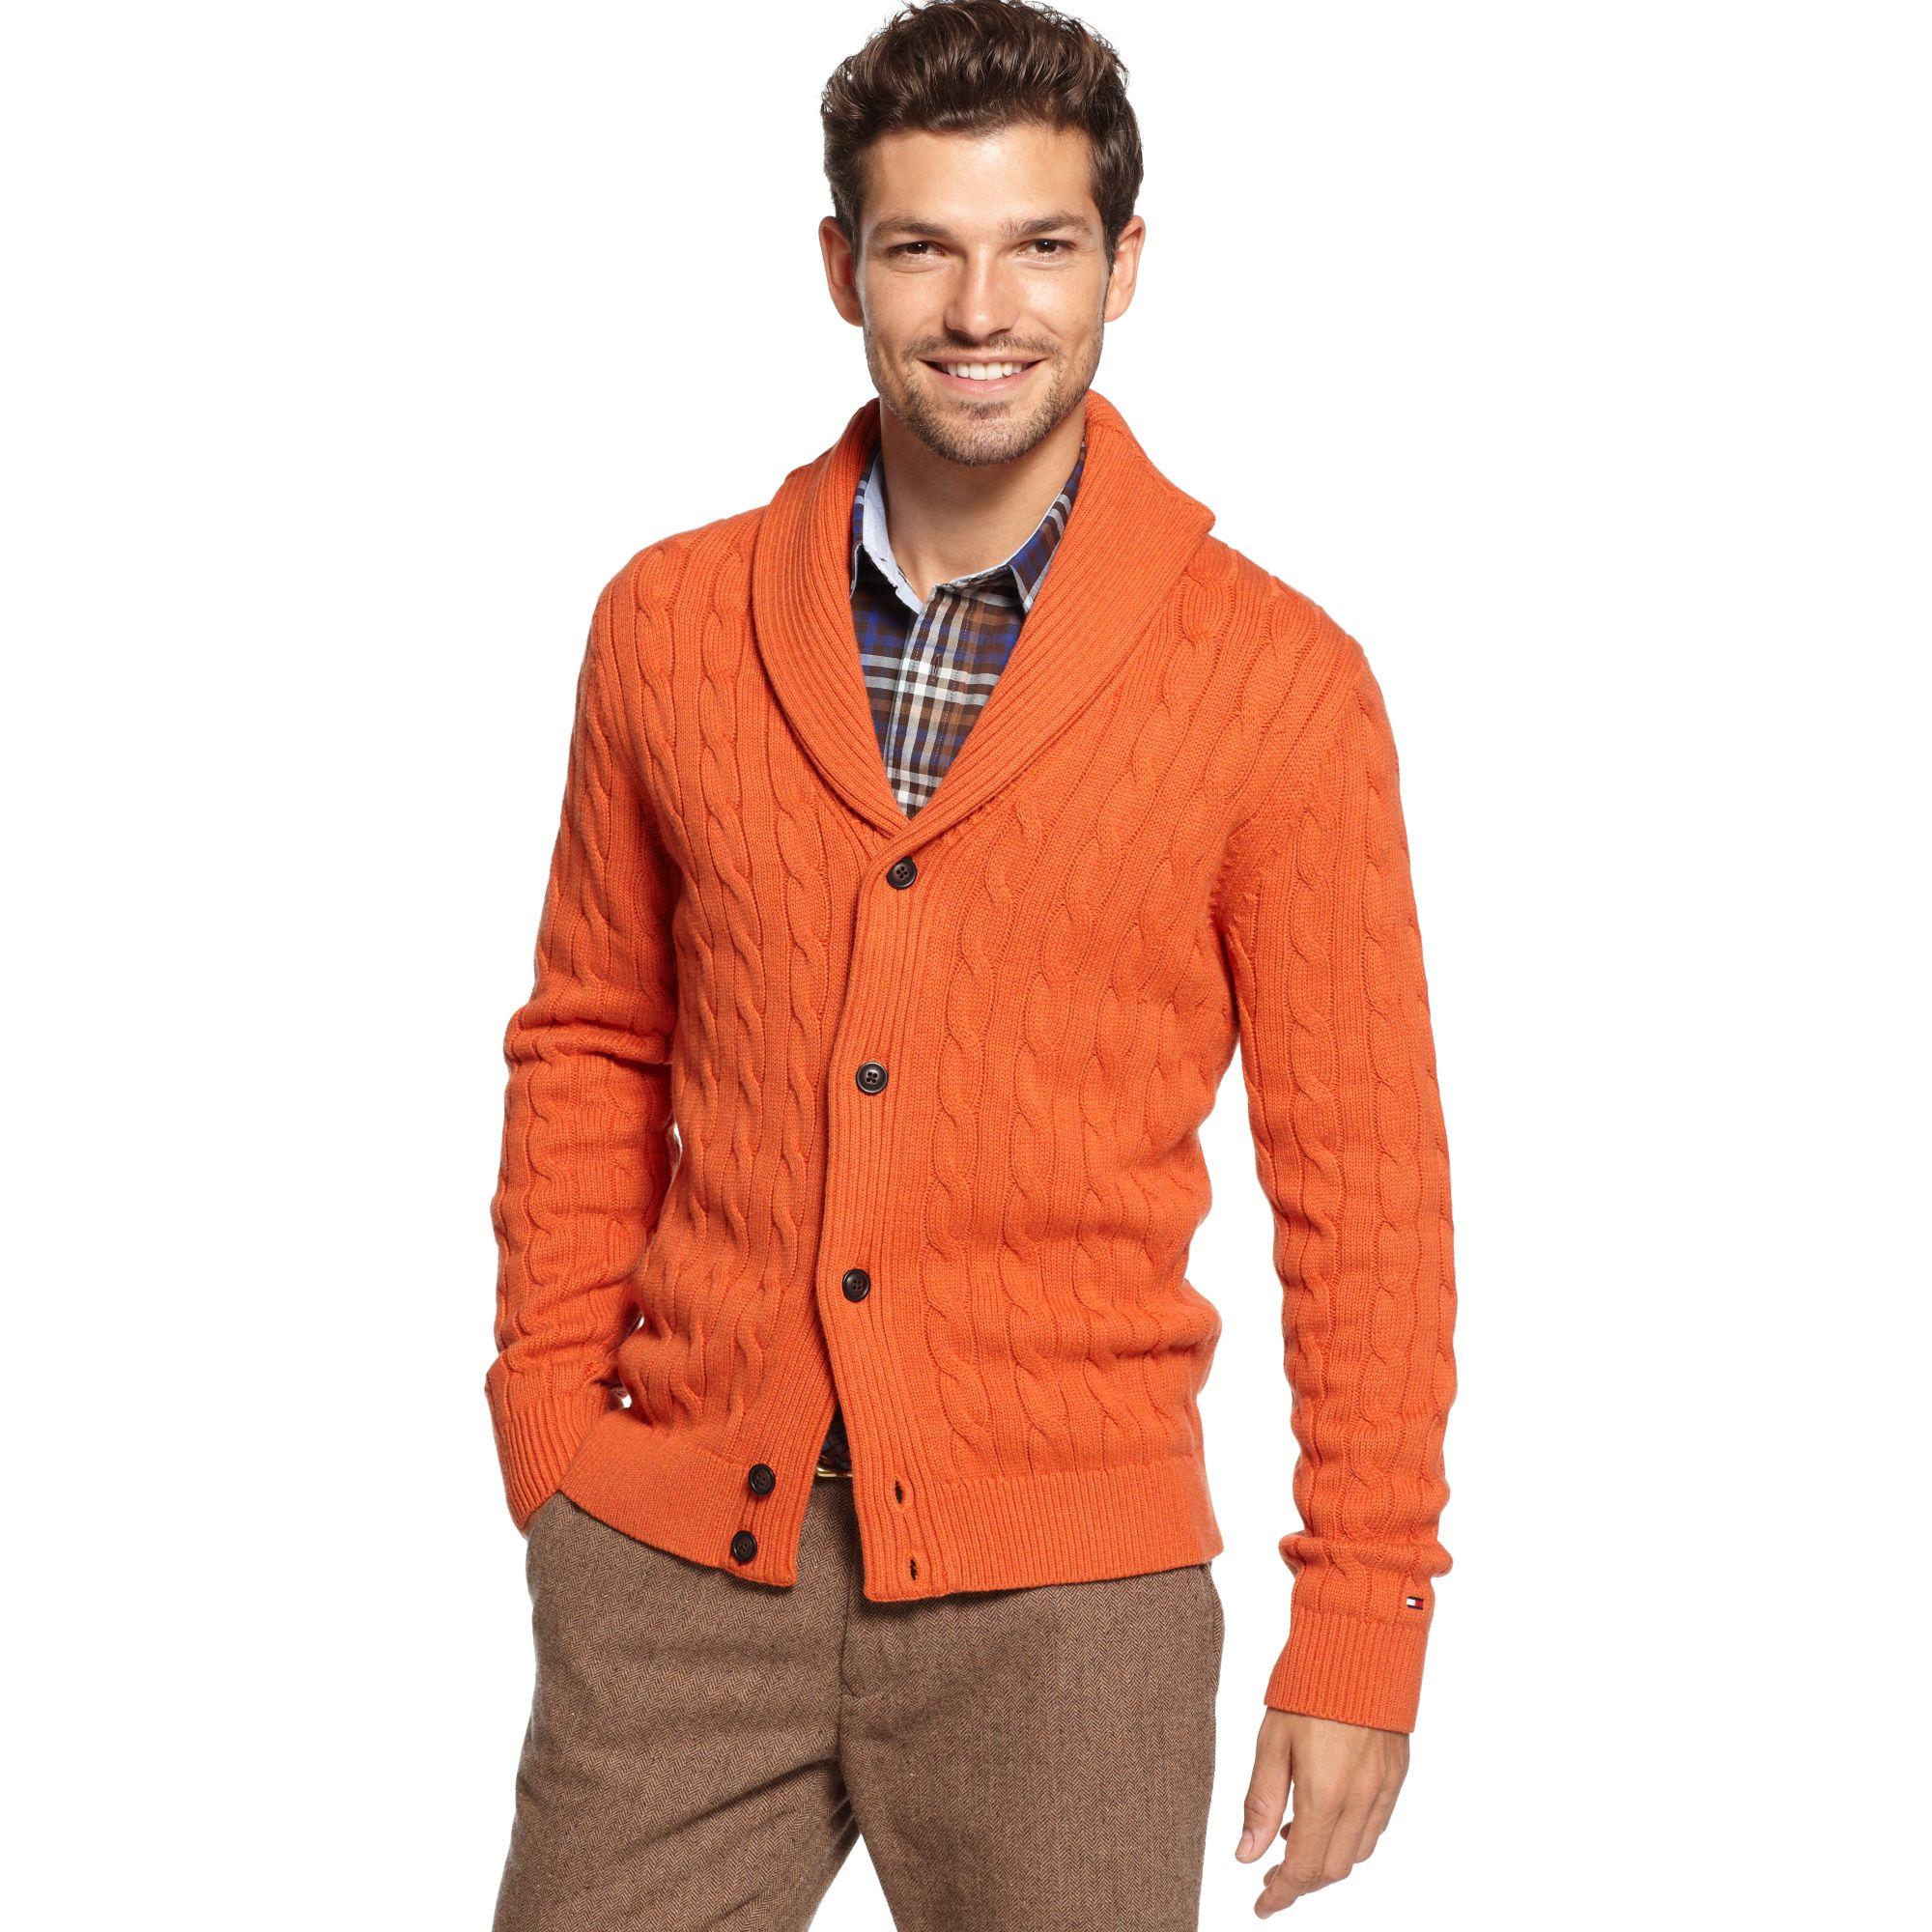 tommy hilfiger brant shawl collar sweater in orange for. Black Bedroom Furniture Sets. Home Design Ideas